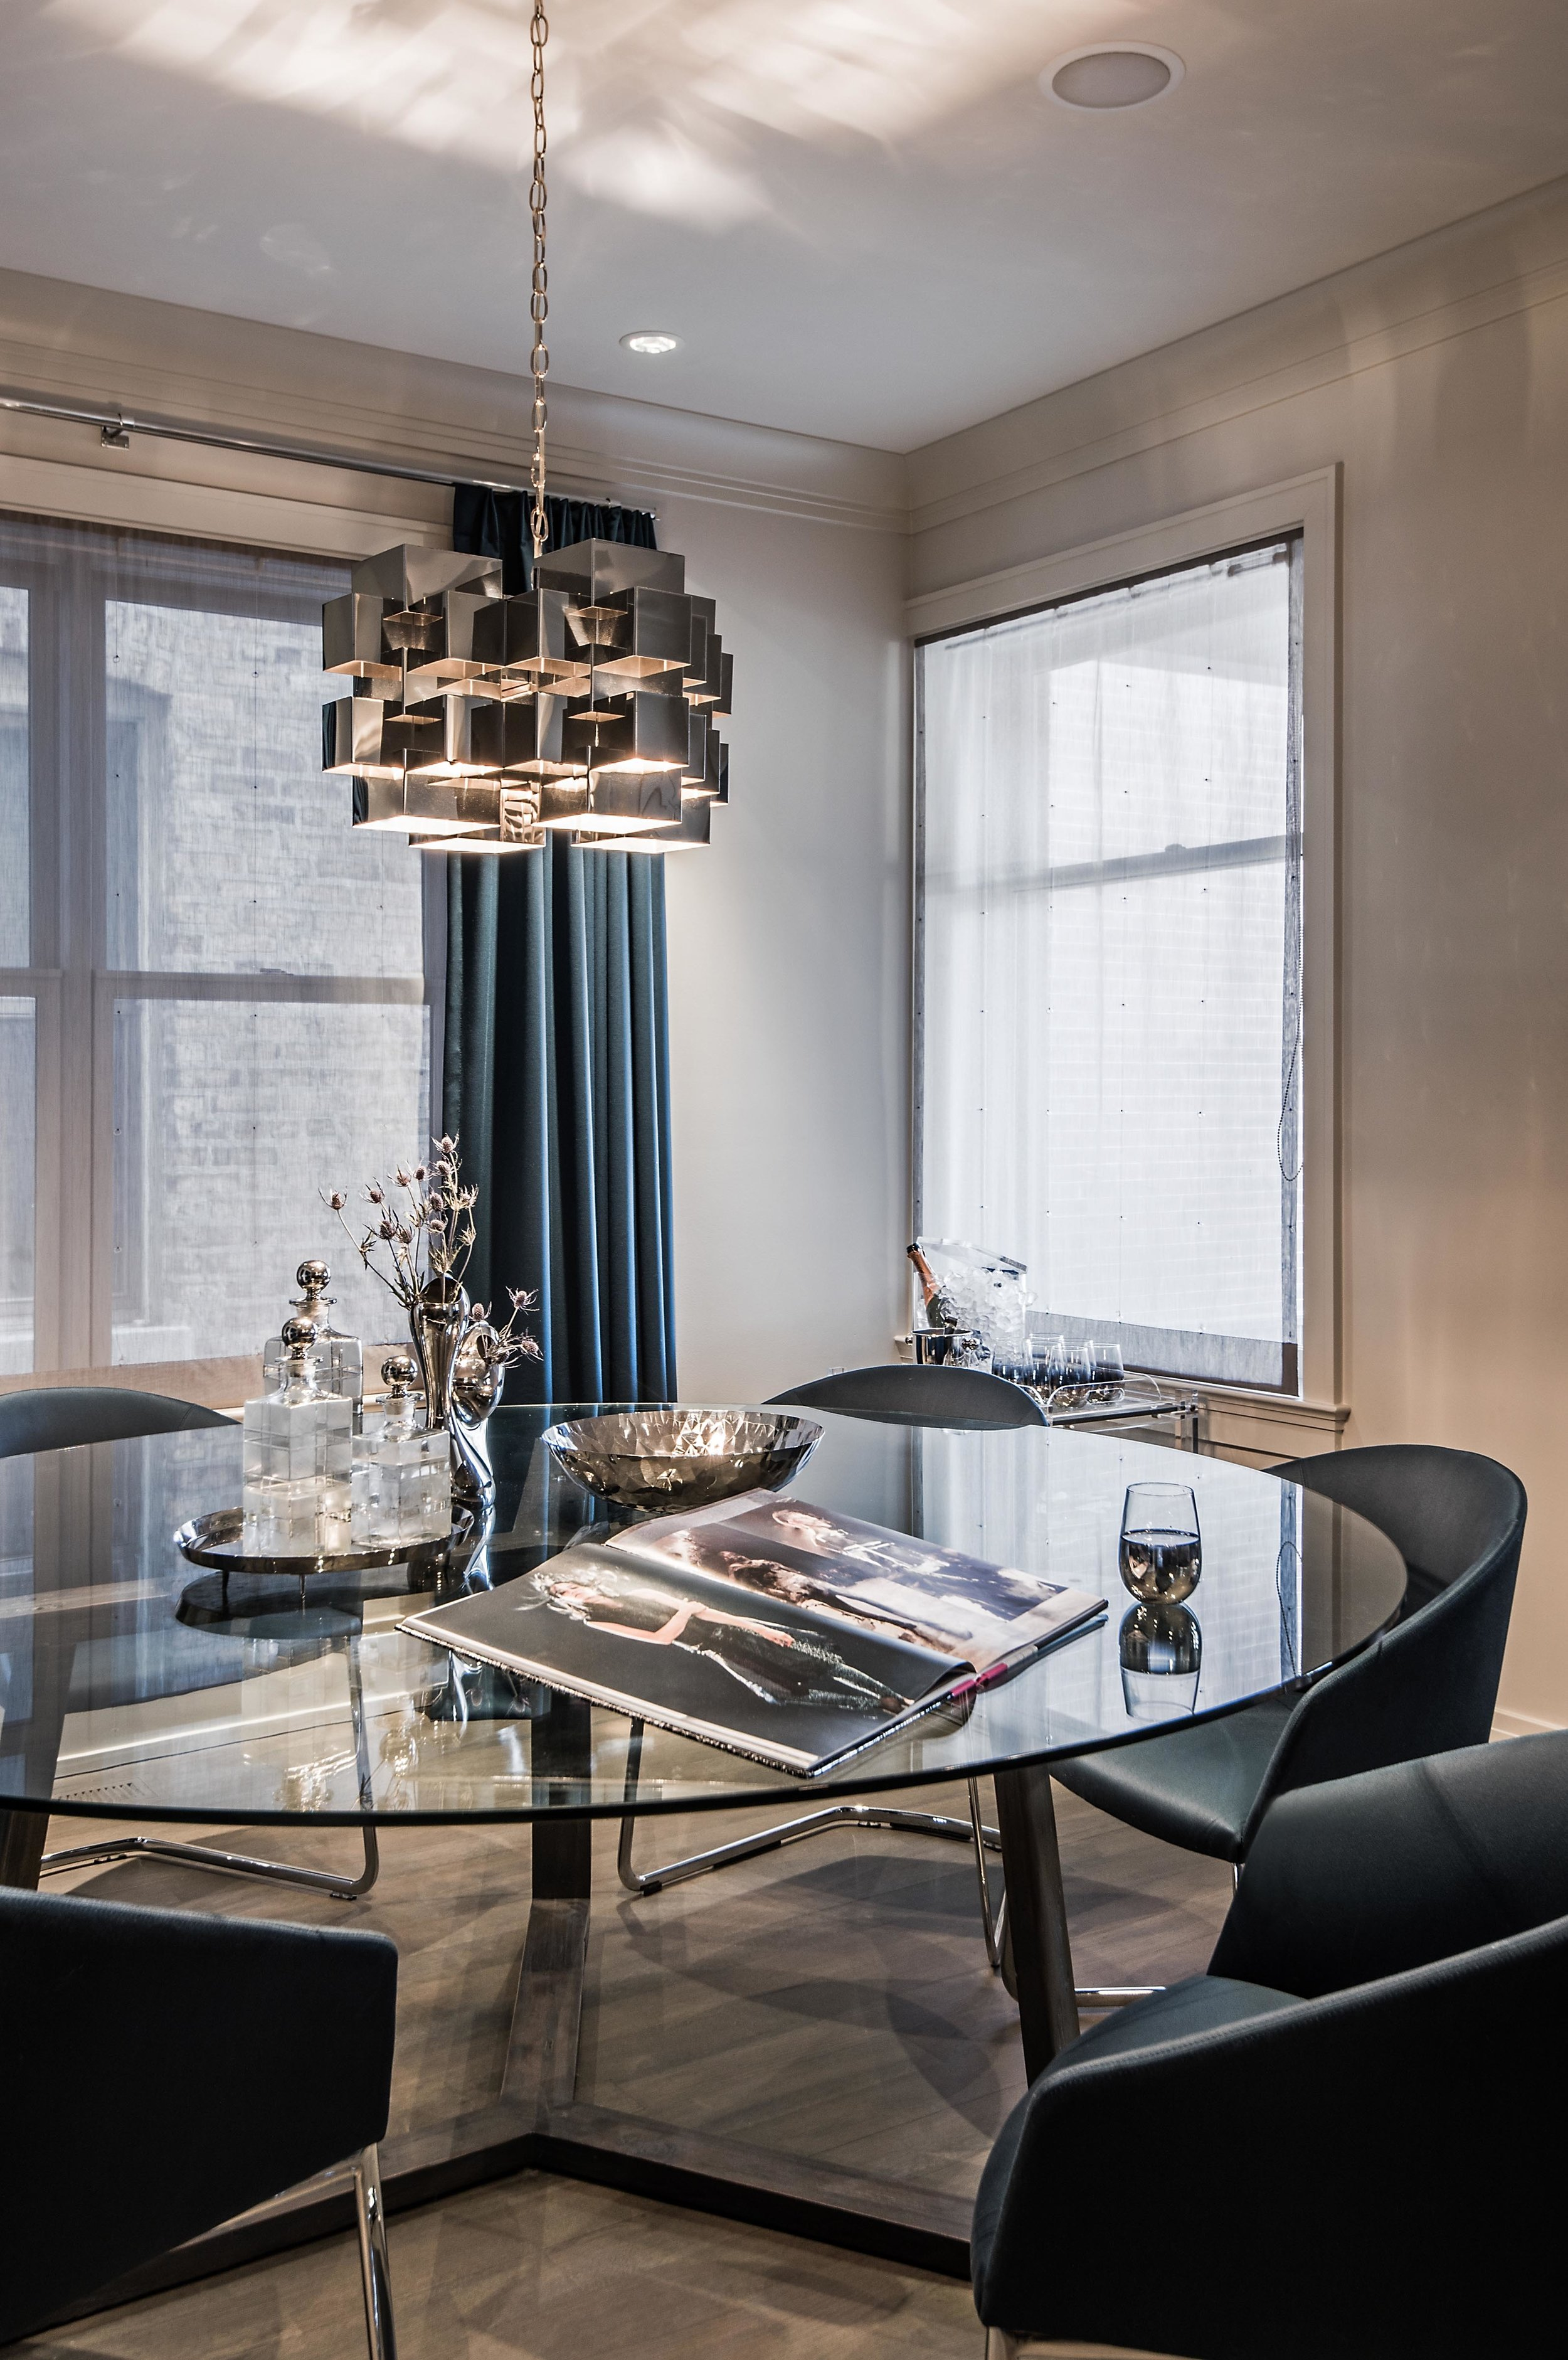 Leo_Designs_Chicago_interior_design_earthy_chic4.jpg